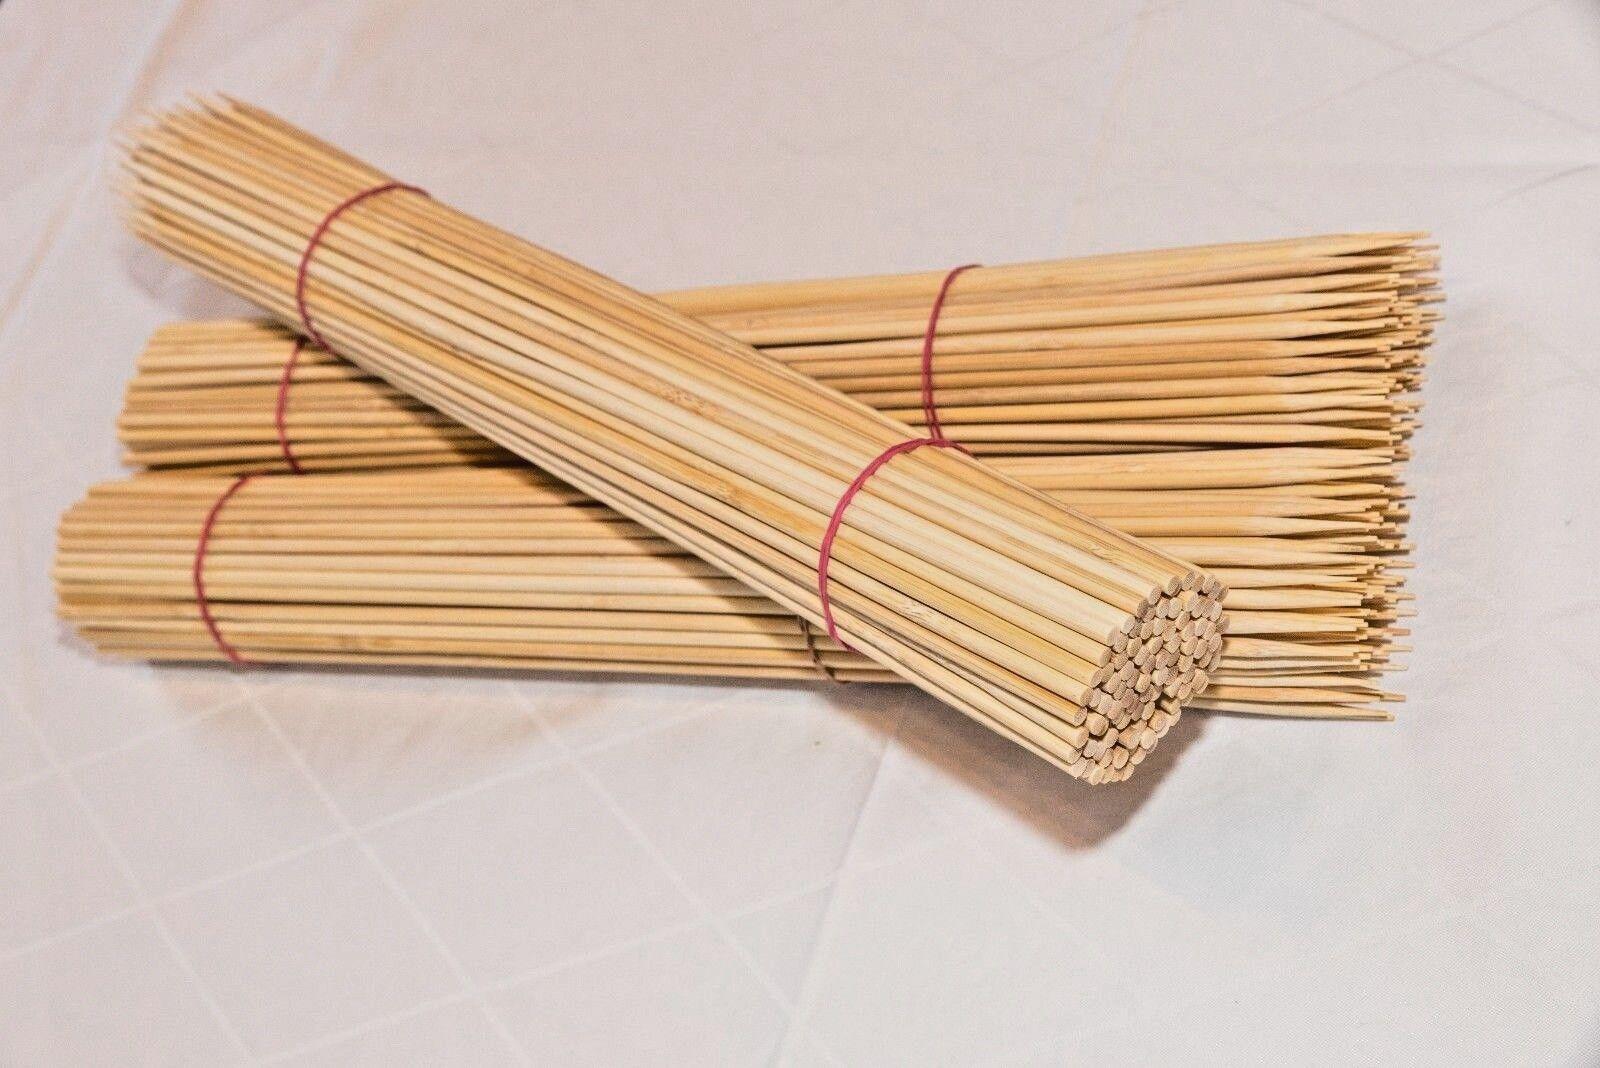 45 cm Bambusspieß Bambus Bambus Bambus Spieße Kartoffelspirale Holz Grill Schaschlik  Ø 5 mm | Neuer Eintrag  10eaea